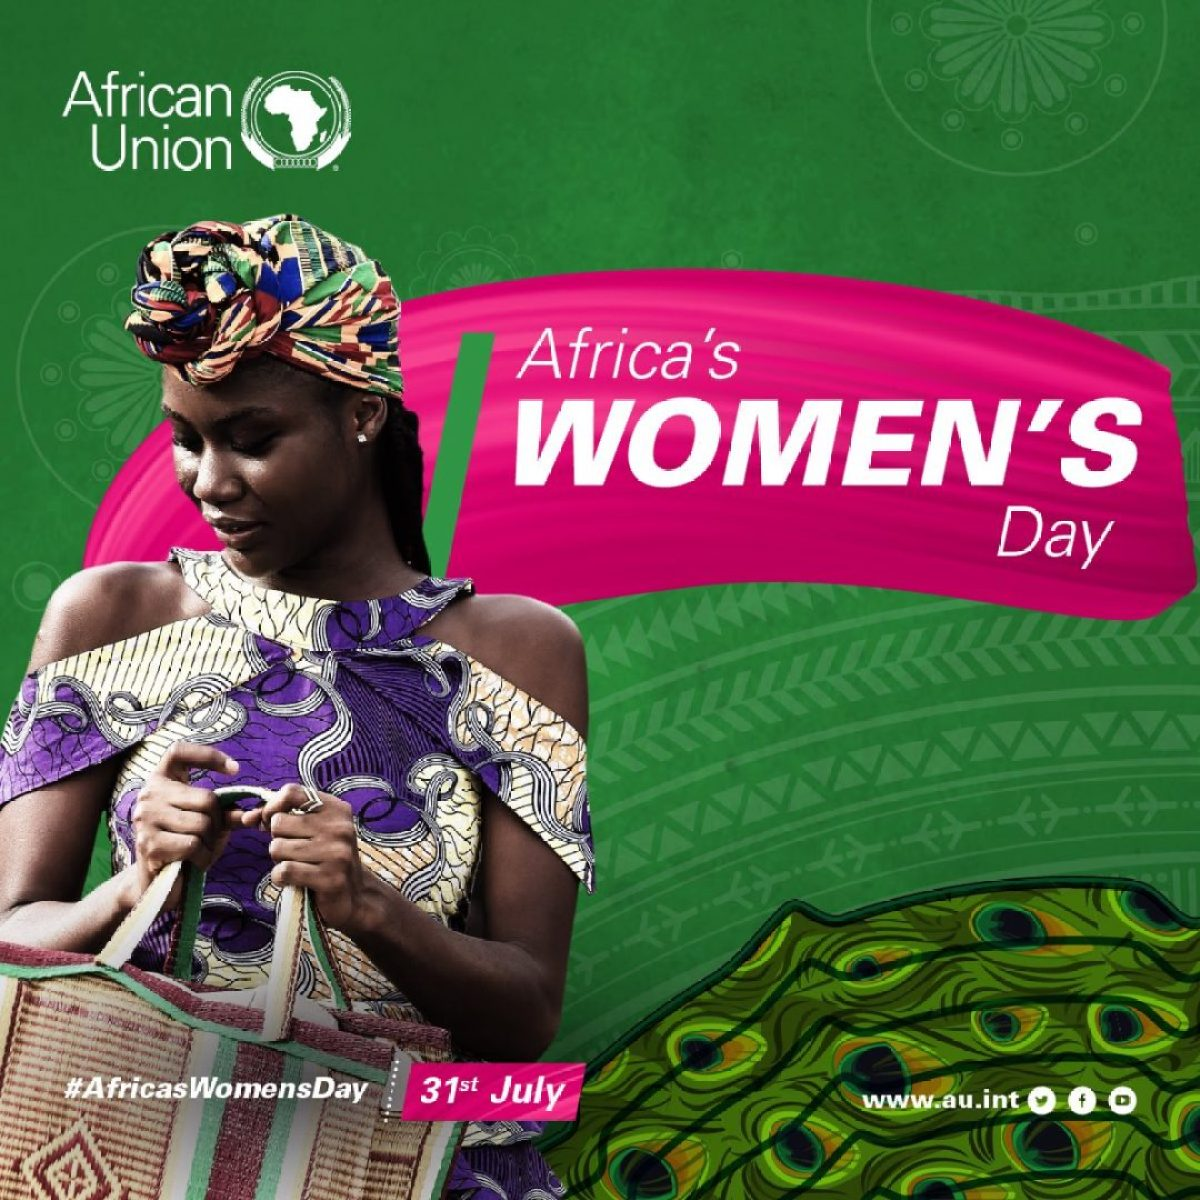 Africa's Women's Day africa